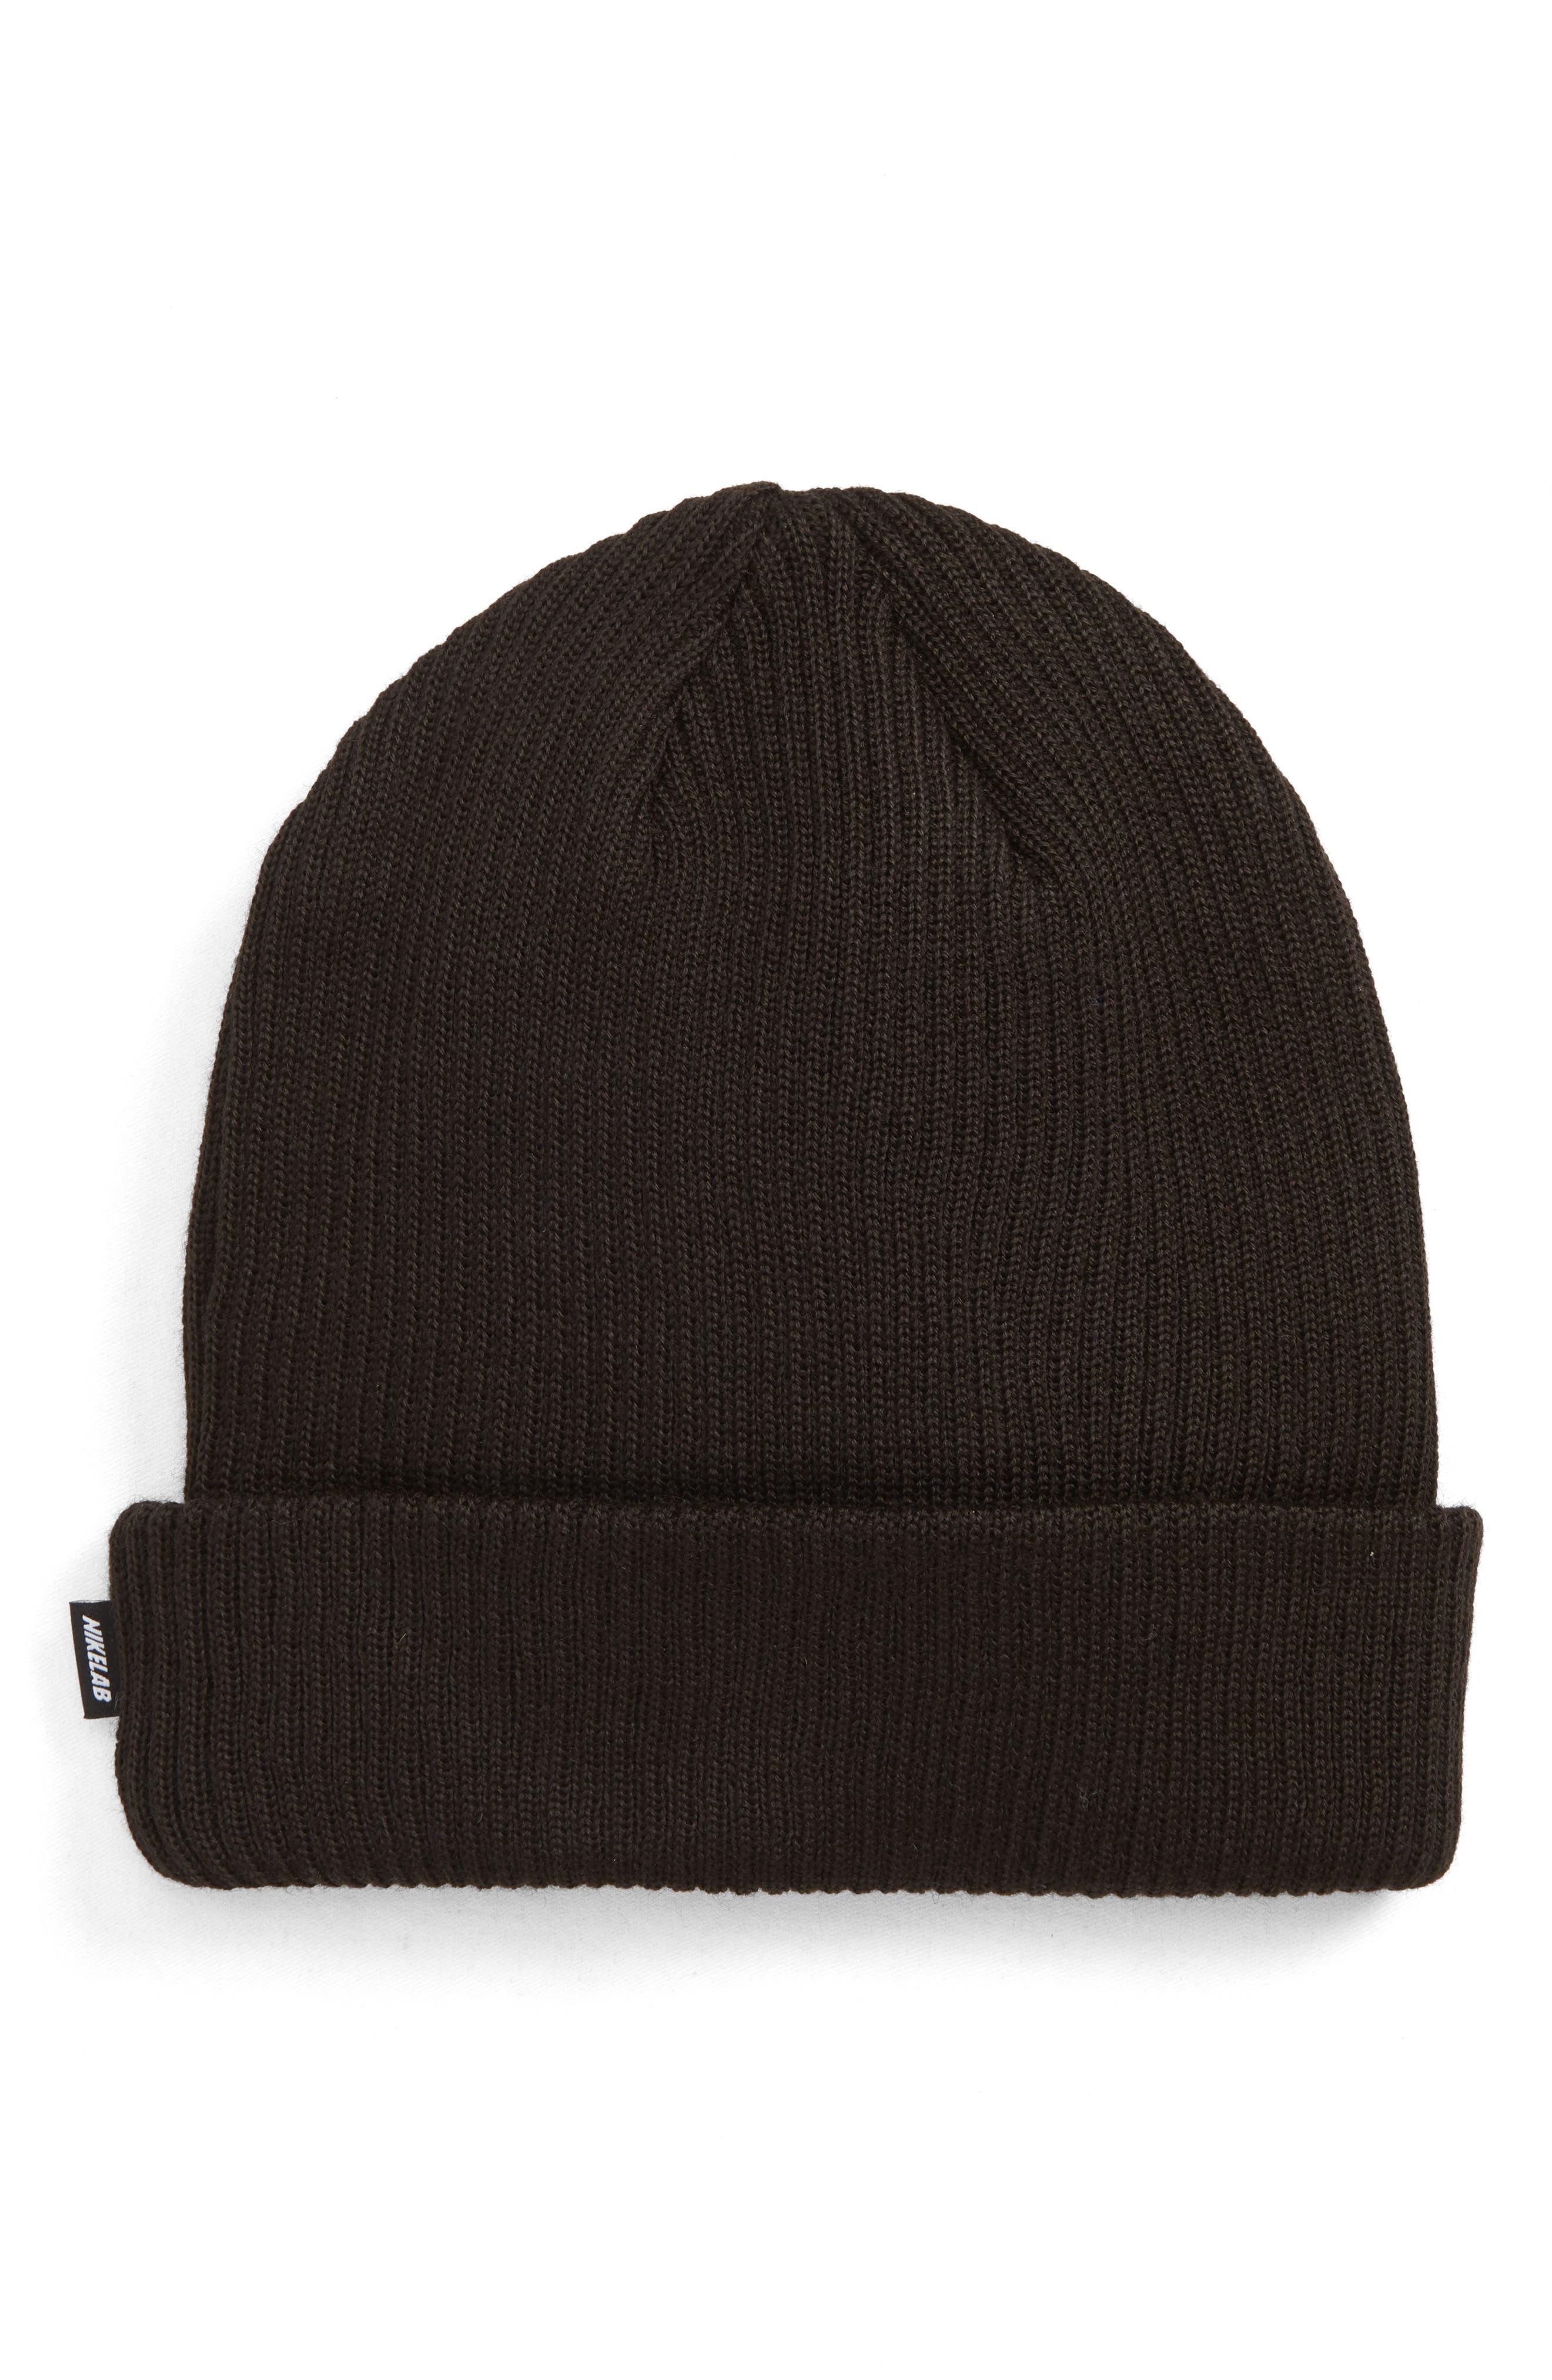 37f43accd39 Men s Beanies  Knit Caps   Winter Hats